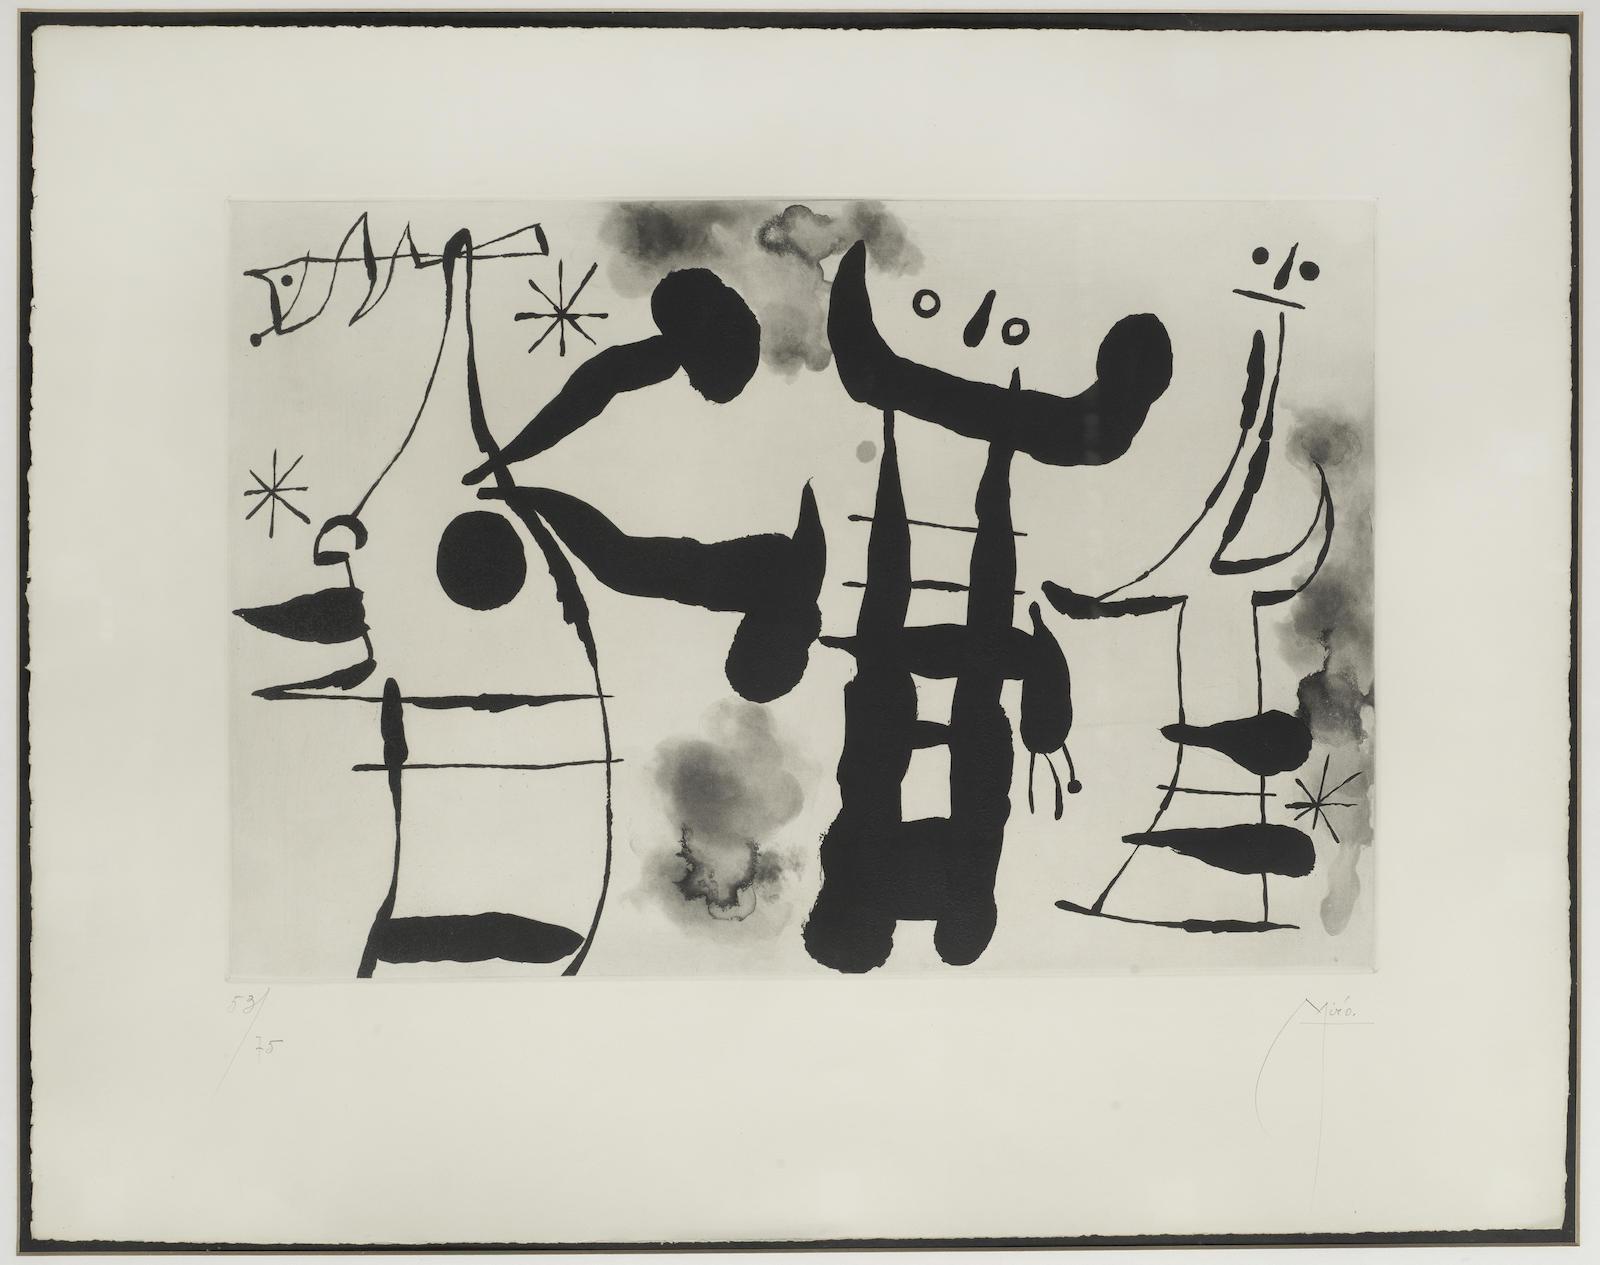 Joan Miro-Les Philosophes I (Dupin 155)-1958